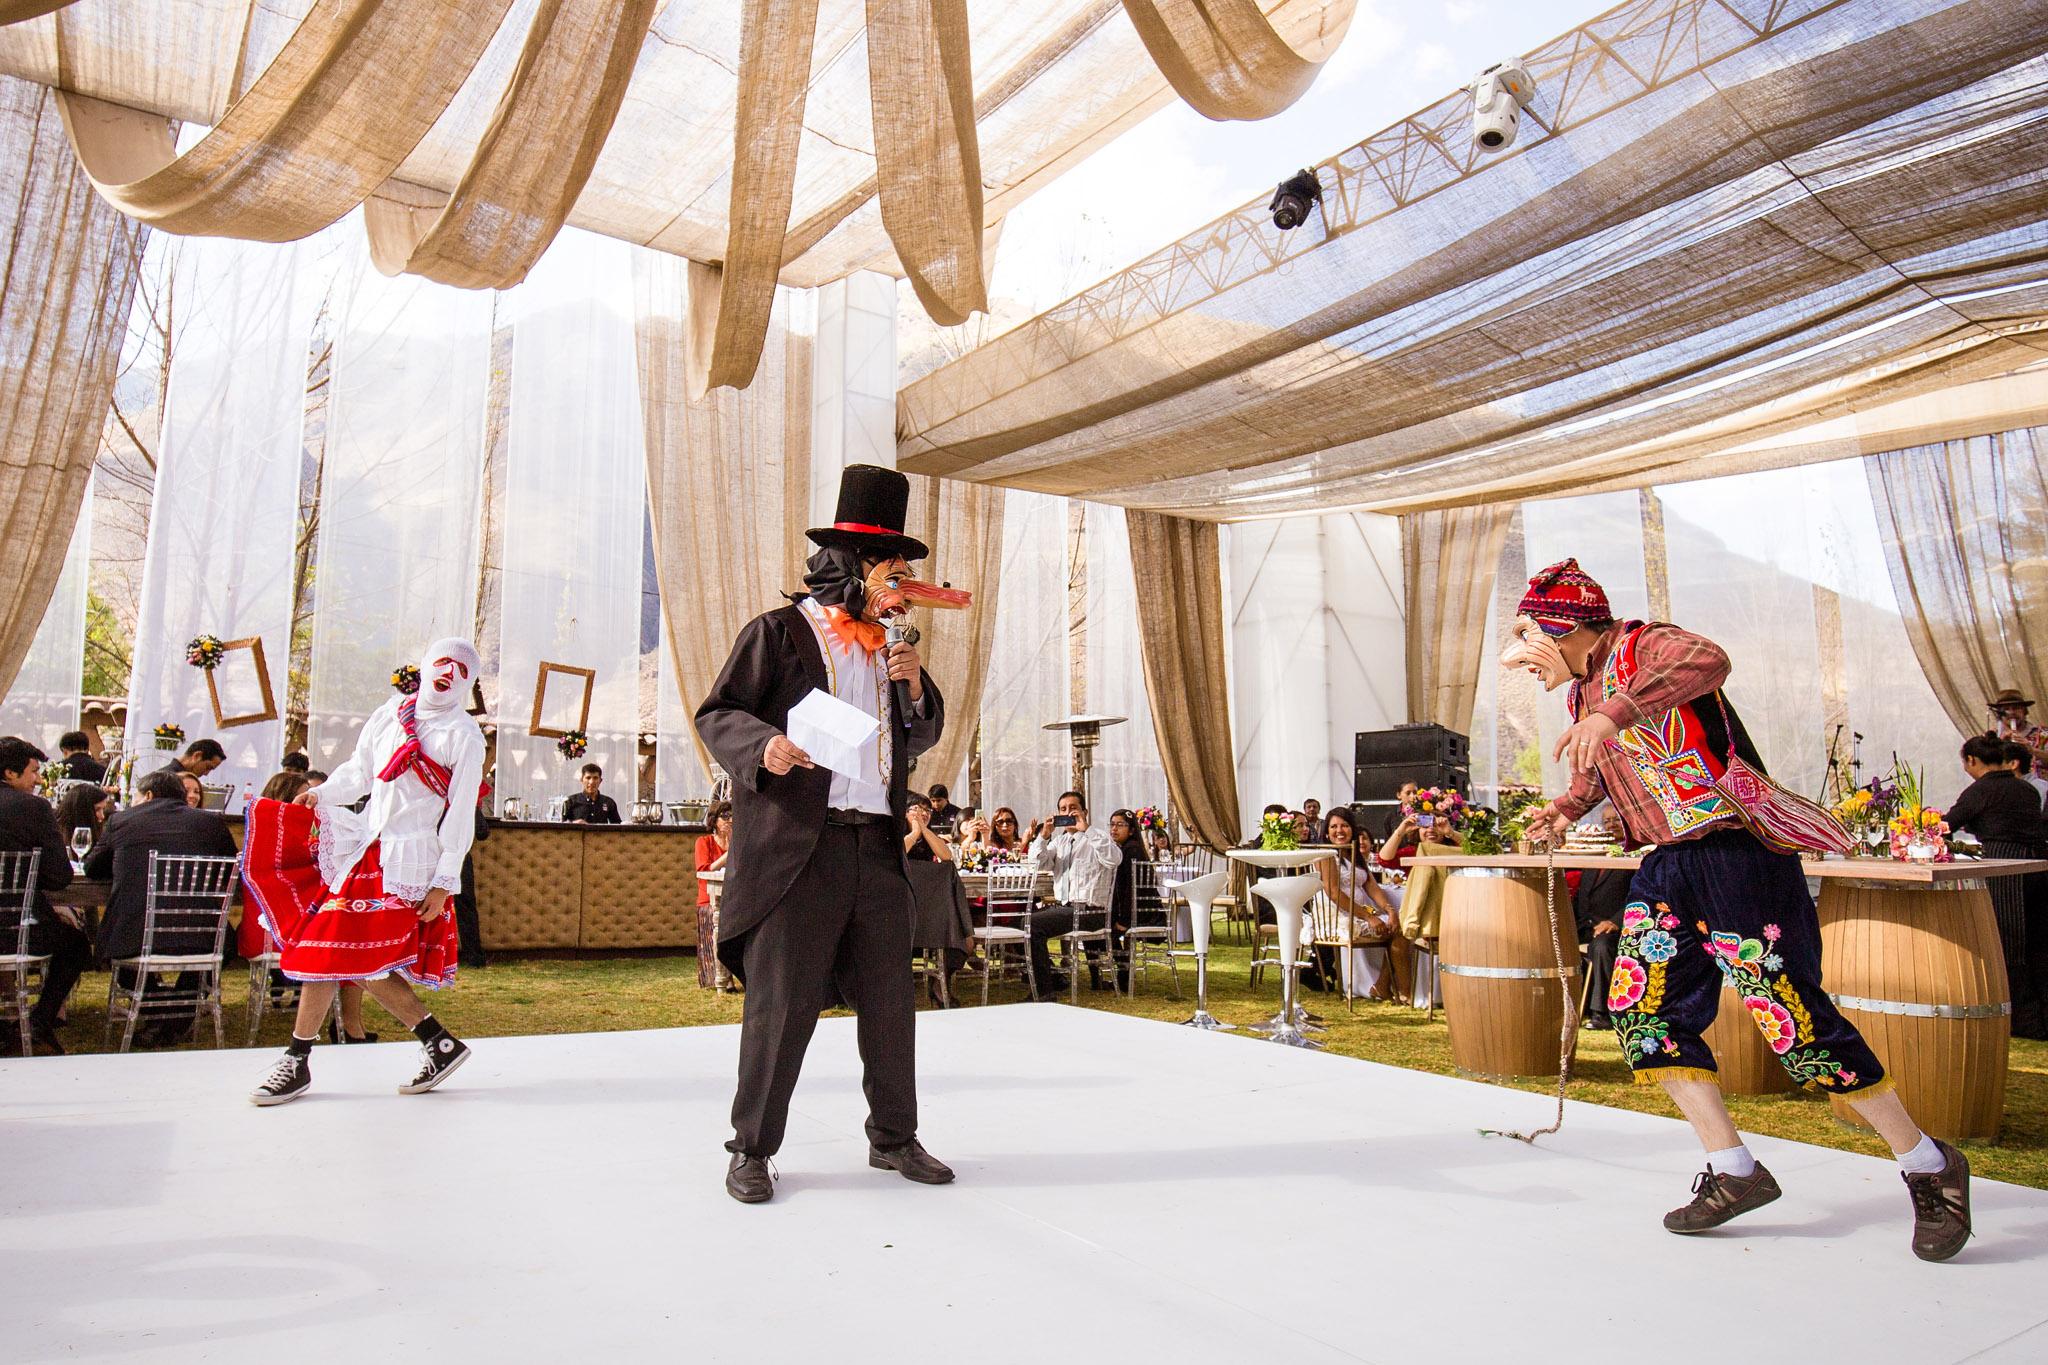 Wedding-Travellers-Destination-Wedding-Peru-Cusco-Hacienda-Sarapampa-Sacred-Valley-traditional-costumes-entertainment